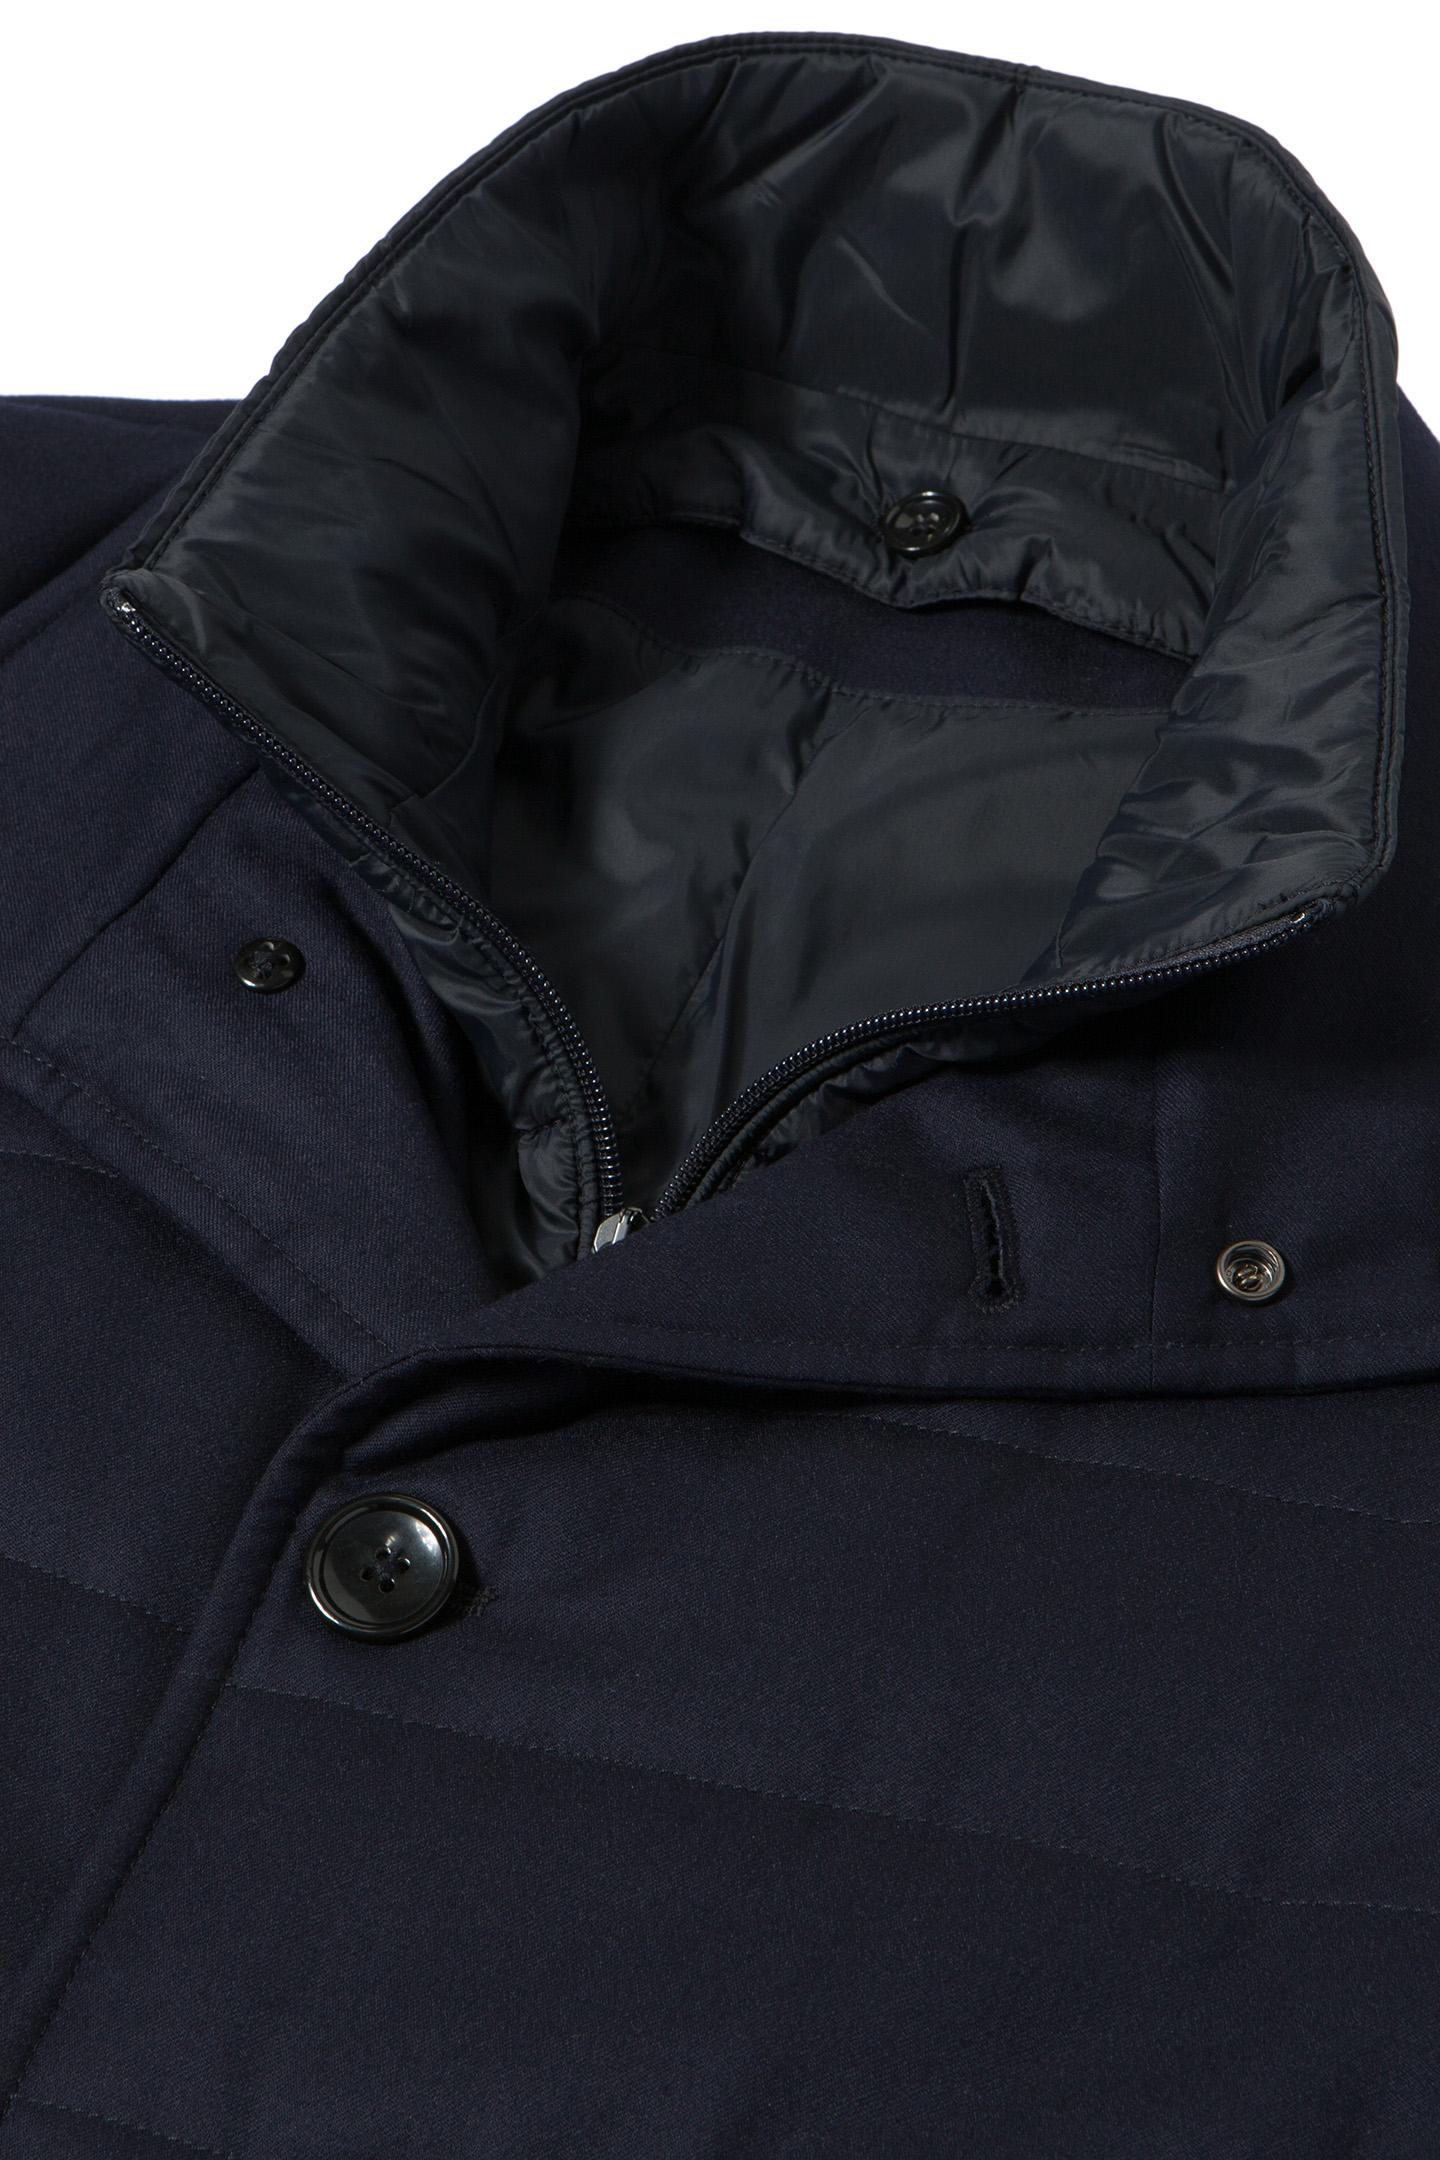 QUILTED PEA COAT WITH BIB - FLANNEL Blue | Boggi : quilted pea coat - Adamdwight.com